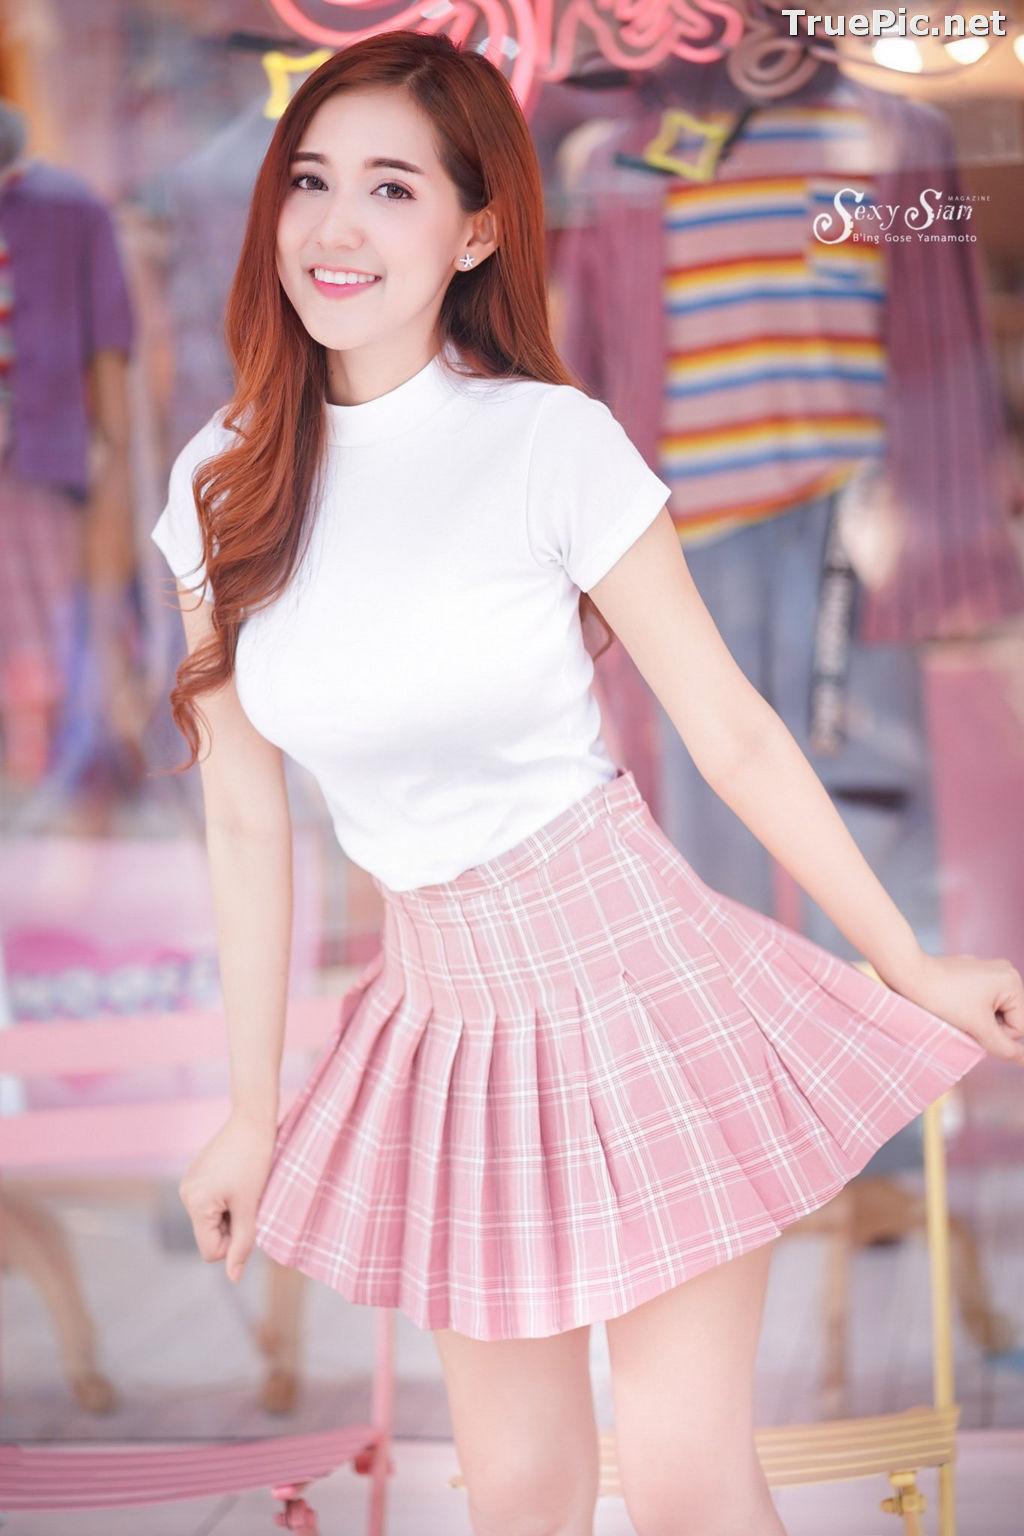 Image Thailand Model - Jarunya Boonya - Pink Love Love Love - TruePic.net - Picture-8